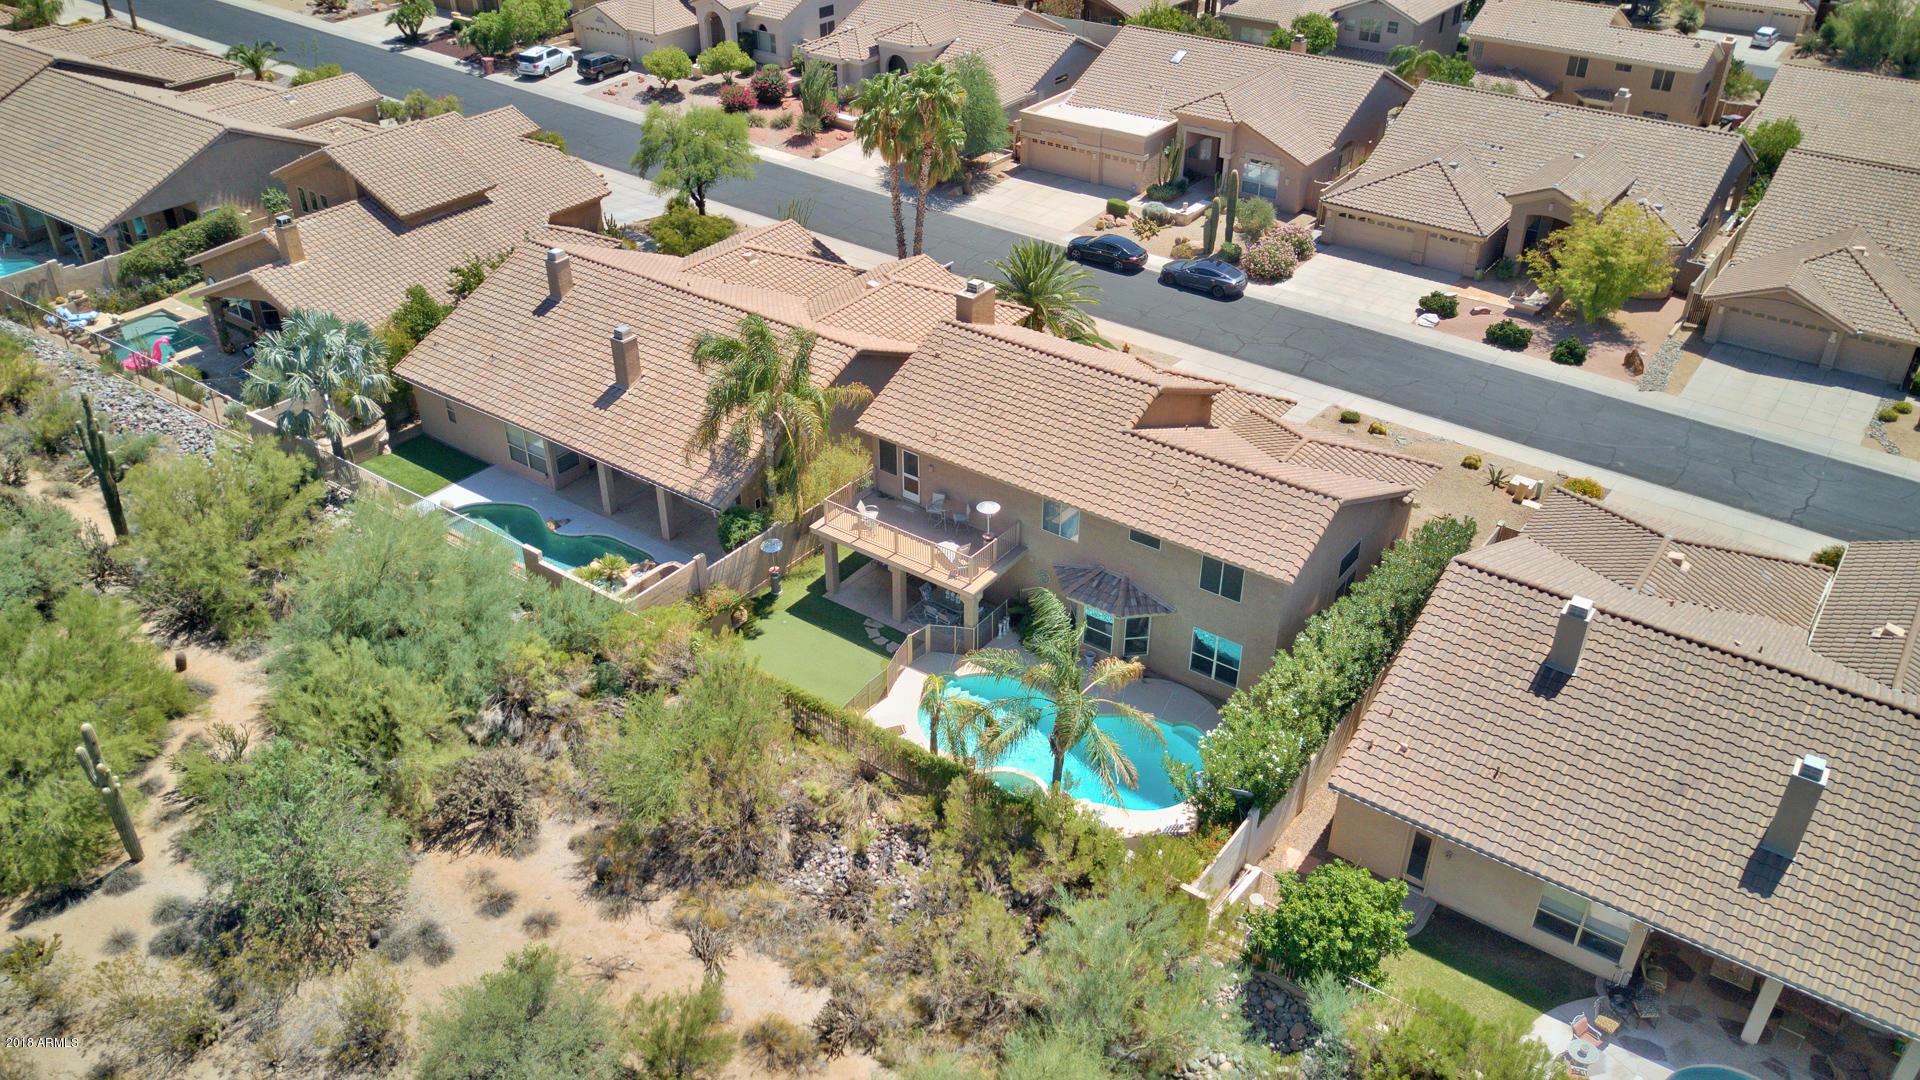 MLS 5817667 7450 E SAND HILLS Road, Scottsdale, AZ 85255 Scottsdale AZ Bank Owned